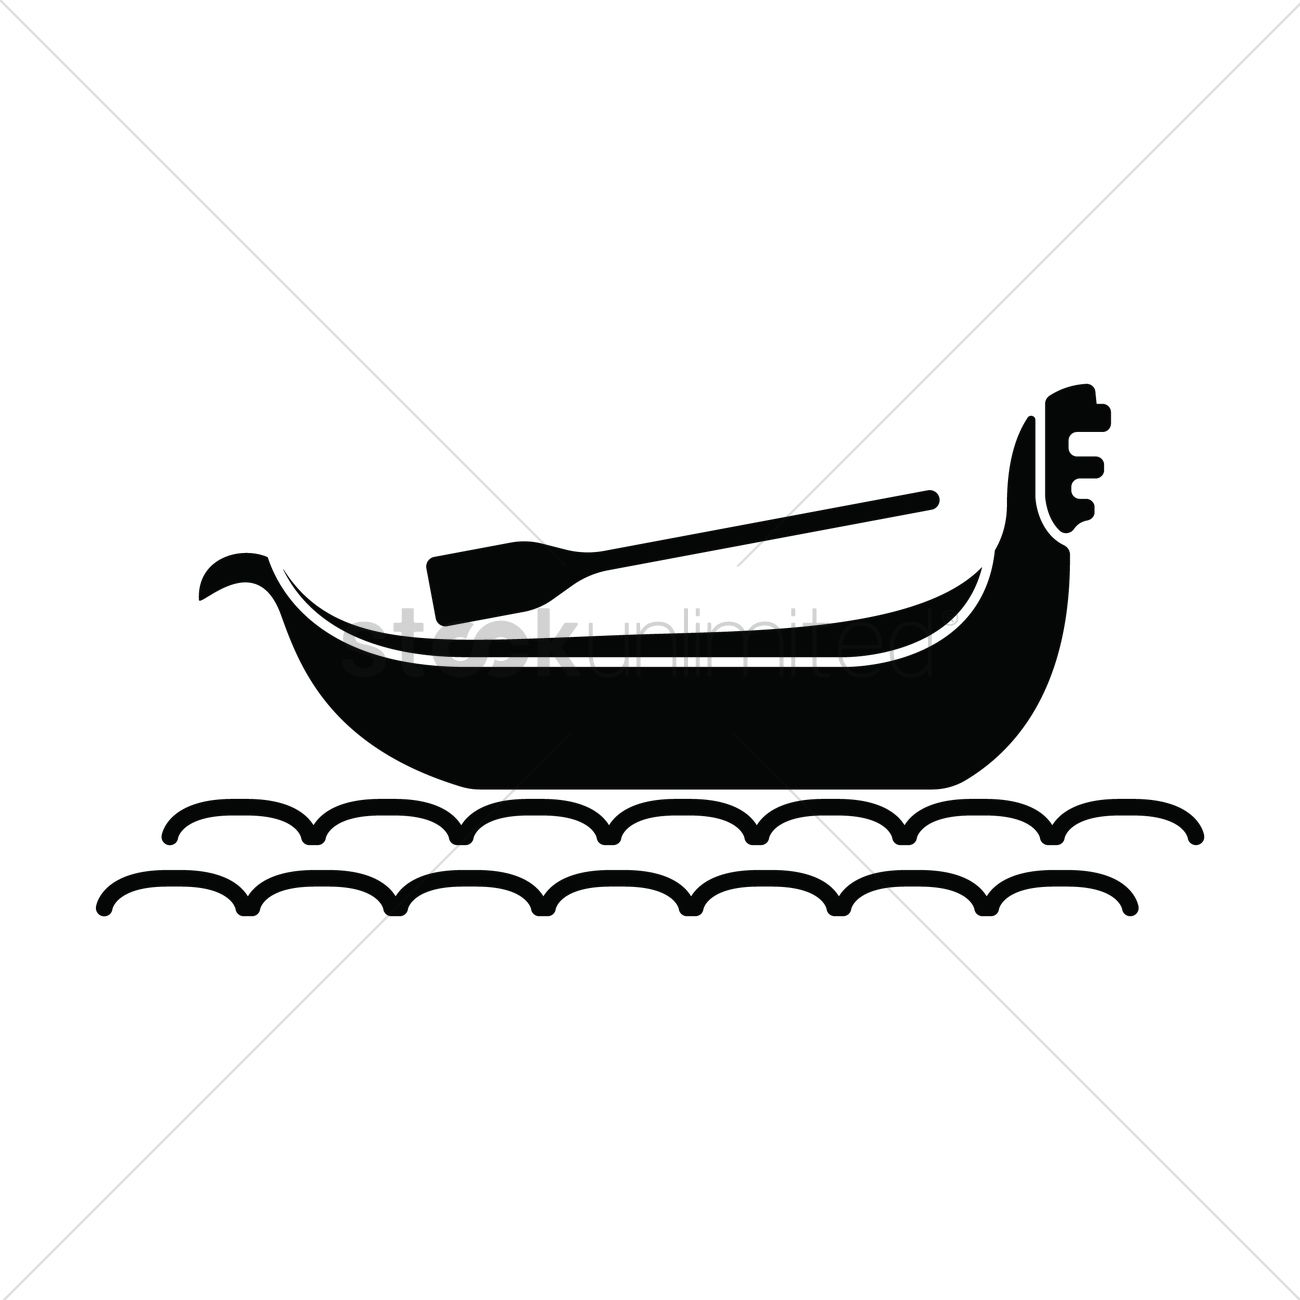 Venetian Gondola Boat Vector Image